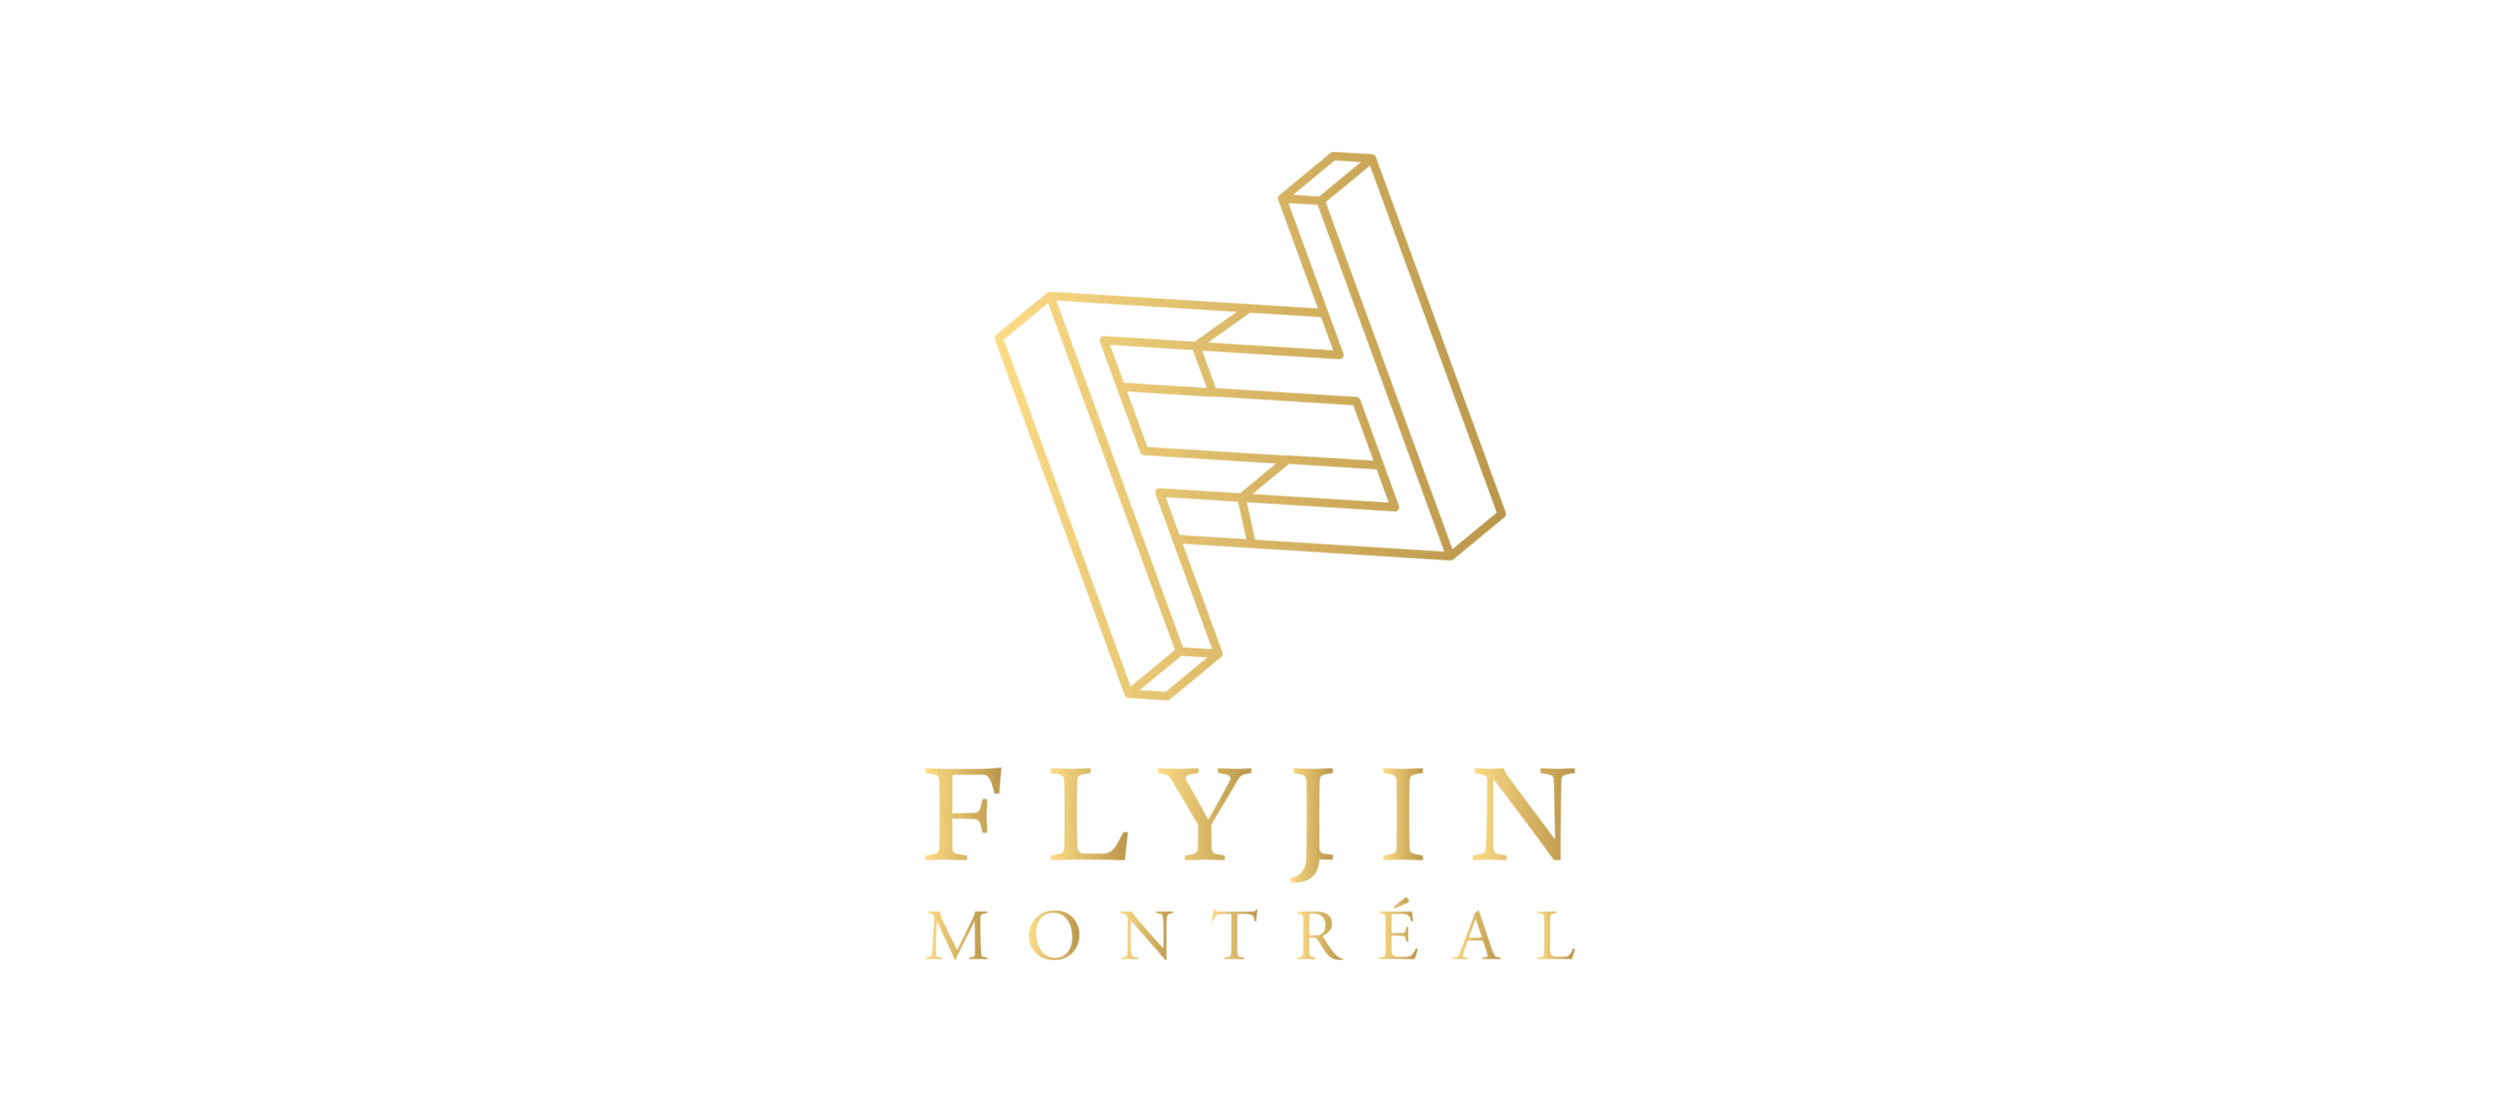 FLYJIN_LOGO.png